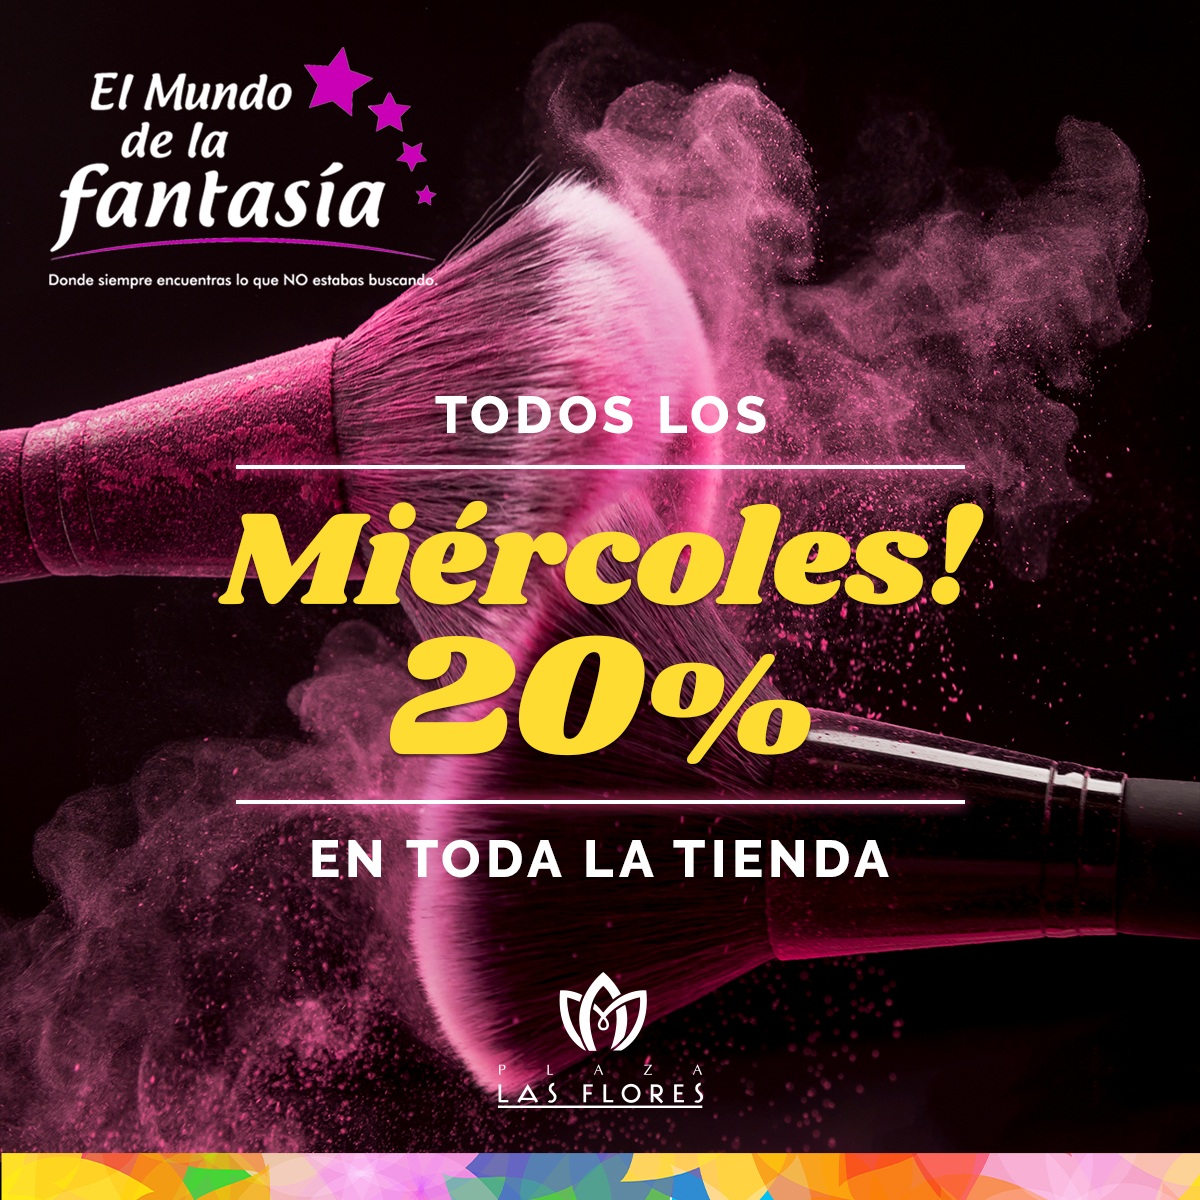 LasFlores-Ofertas-MundoFantasia copy